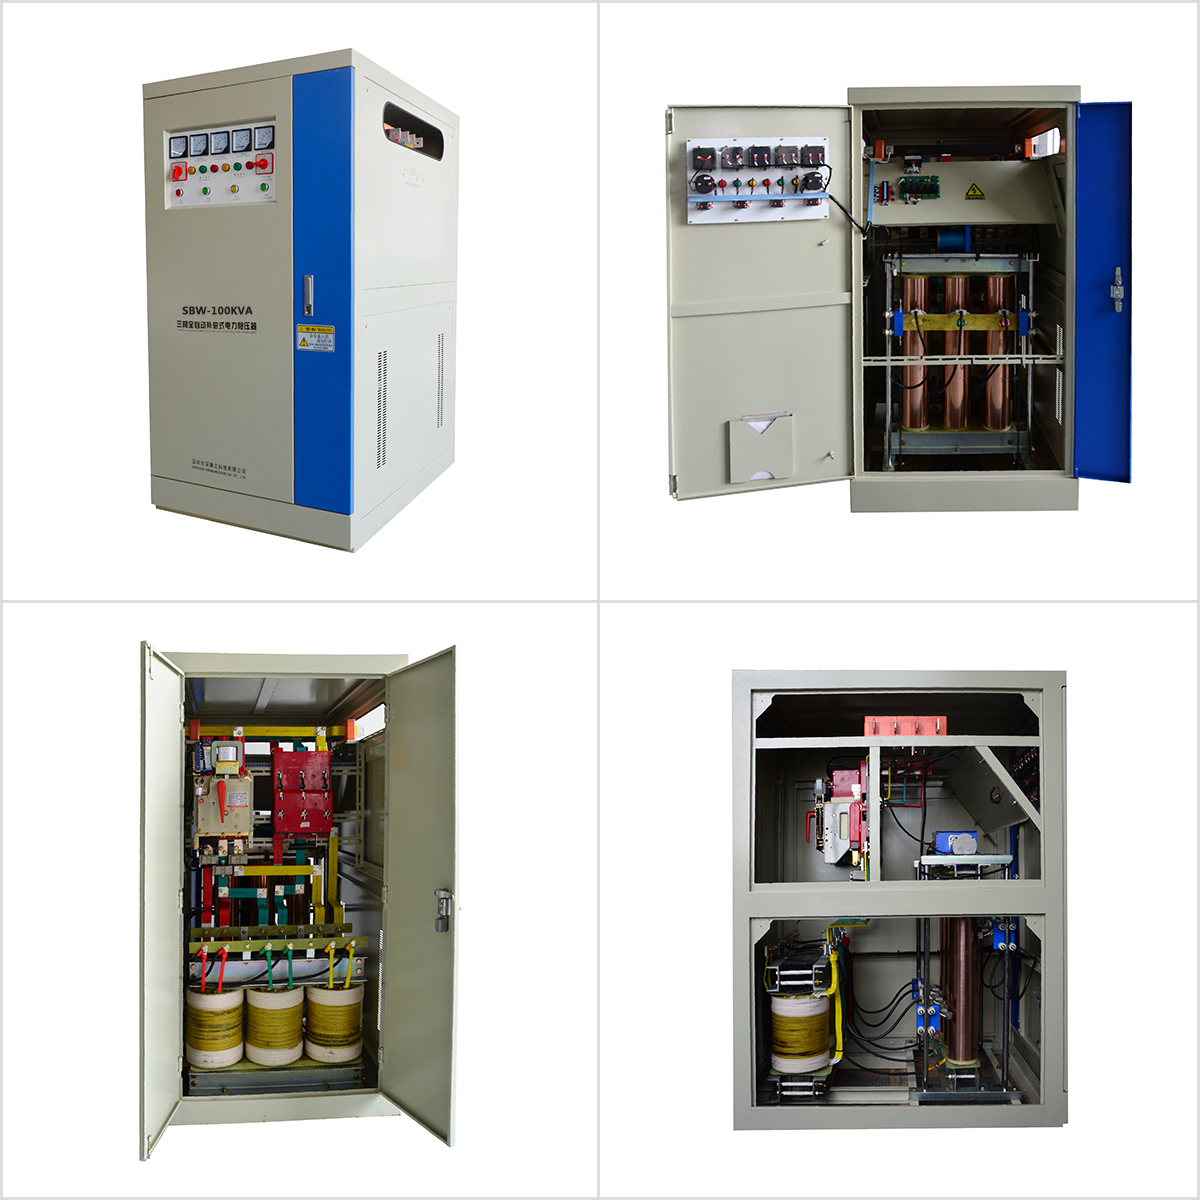 SBW Voltage Stabilizer 100KVA